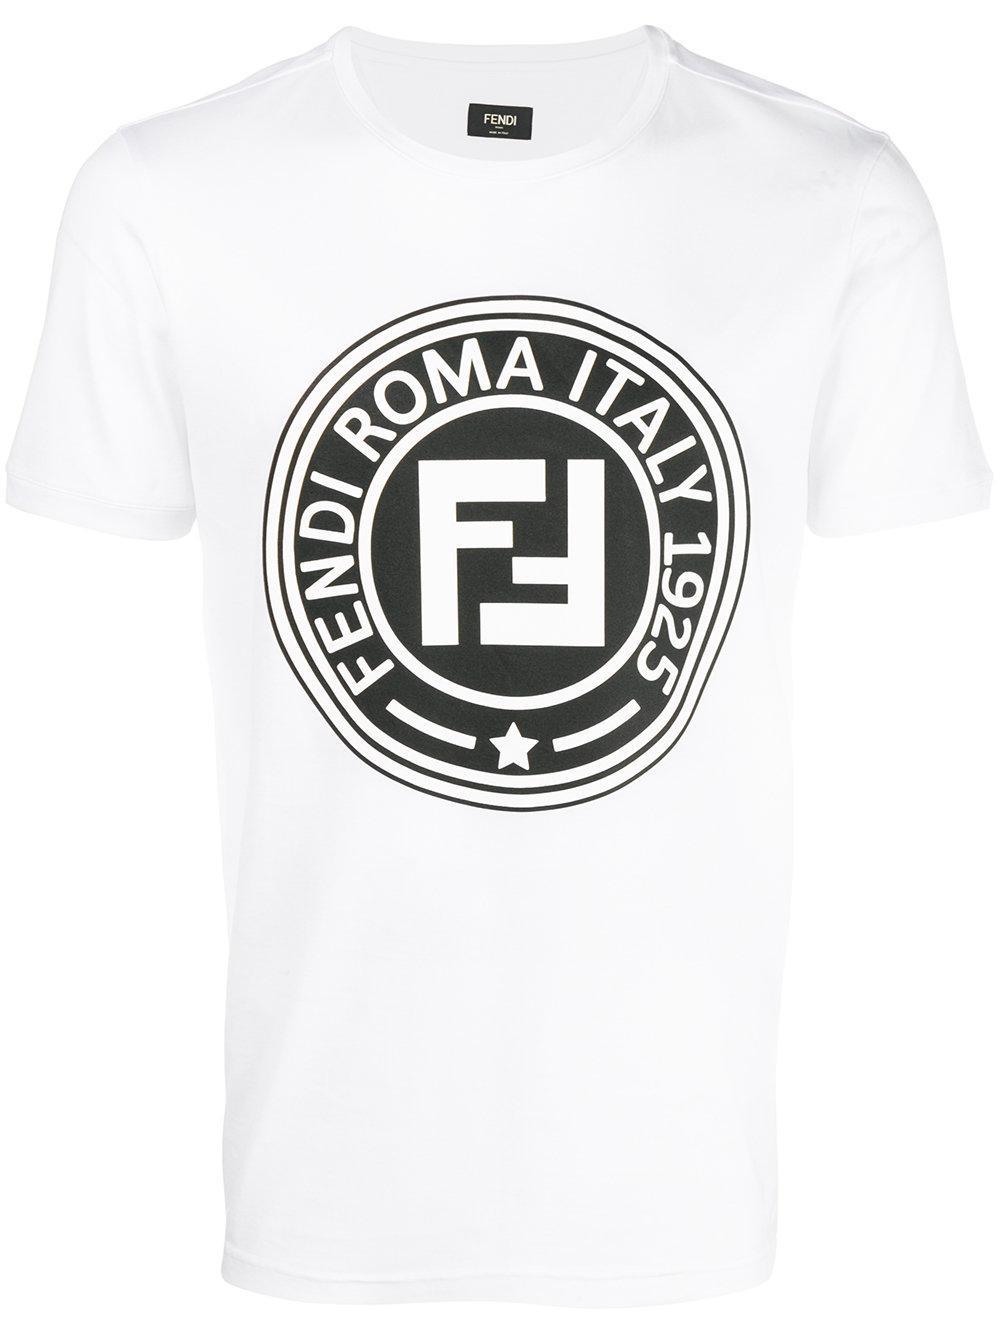 ca083acb60d28e Fendi Cotton T-shirt Circle Logo Print in White for Men - Lyst